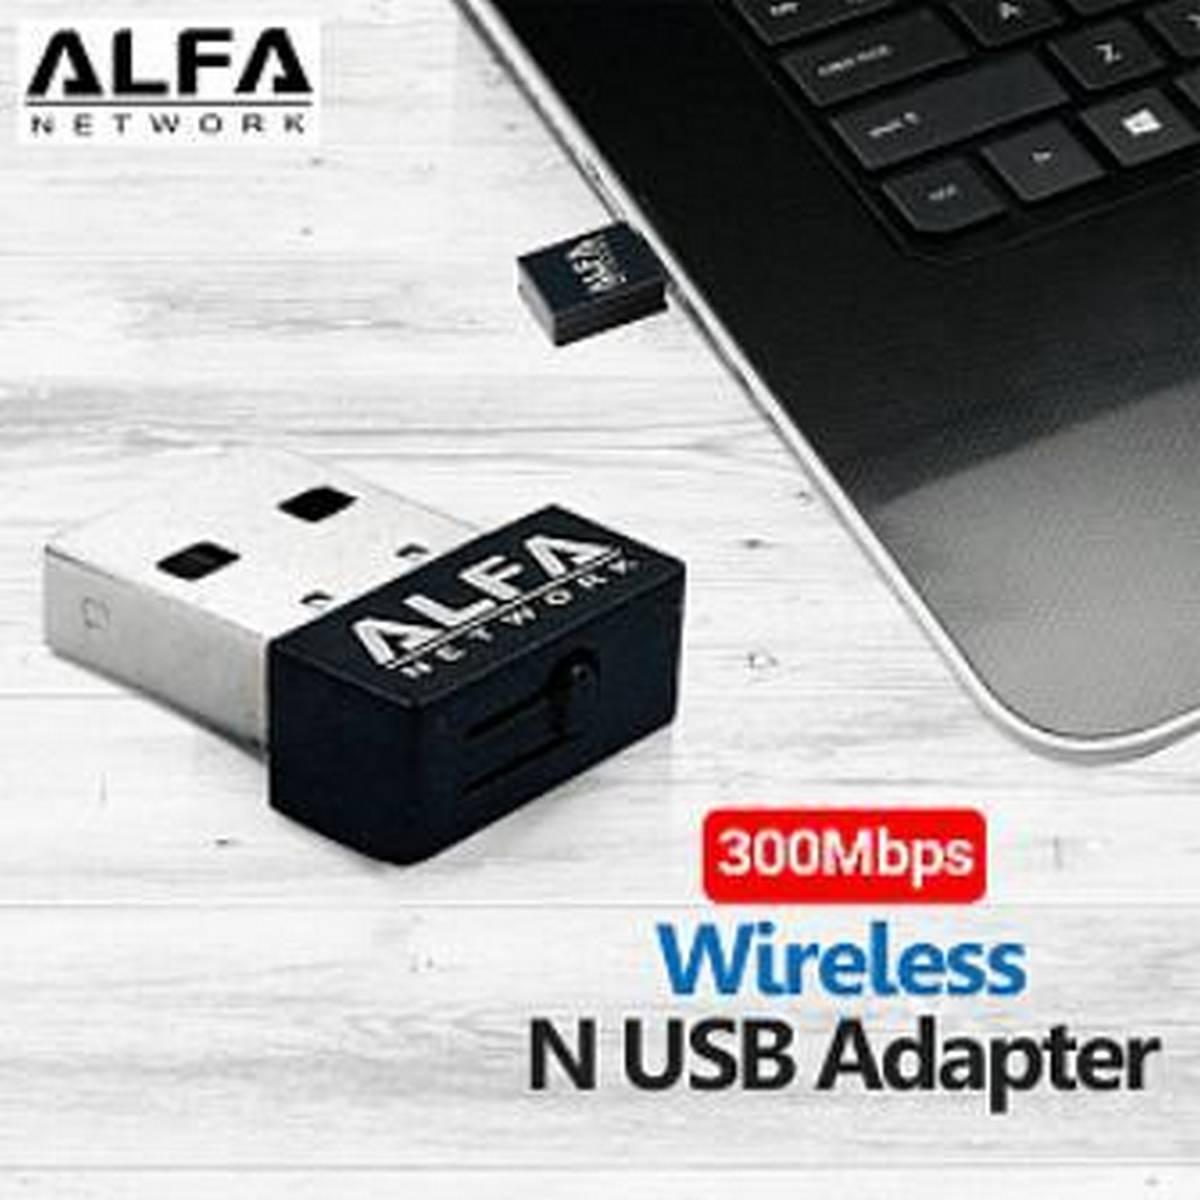 Alfa Wifi Usb Adapter Mini 300 Mbps - Usb Wifi bluetooth - Wifi Bluetooth - Stronger Signal Gain Devices - Signals Transmission Device